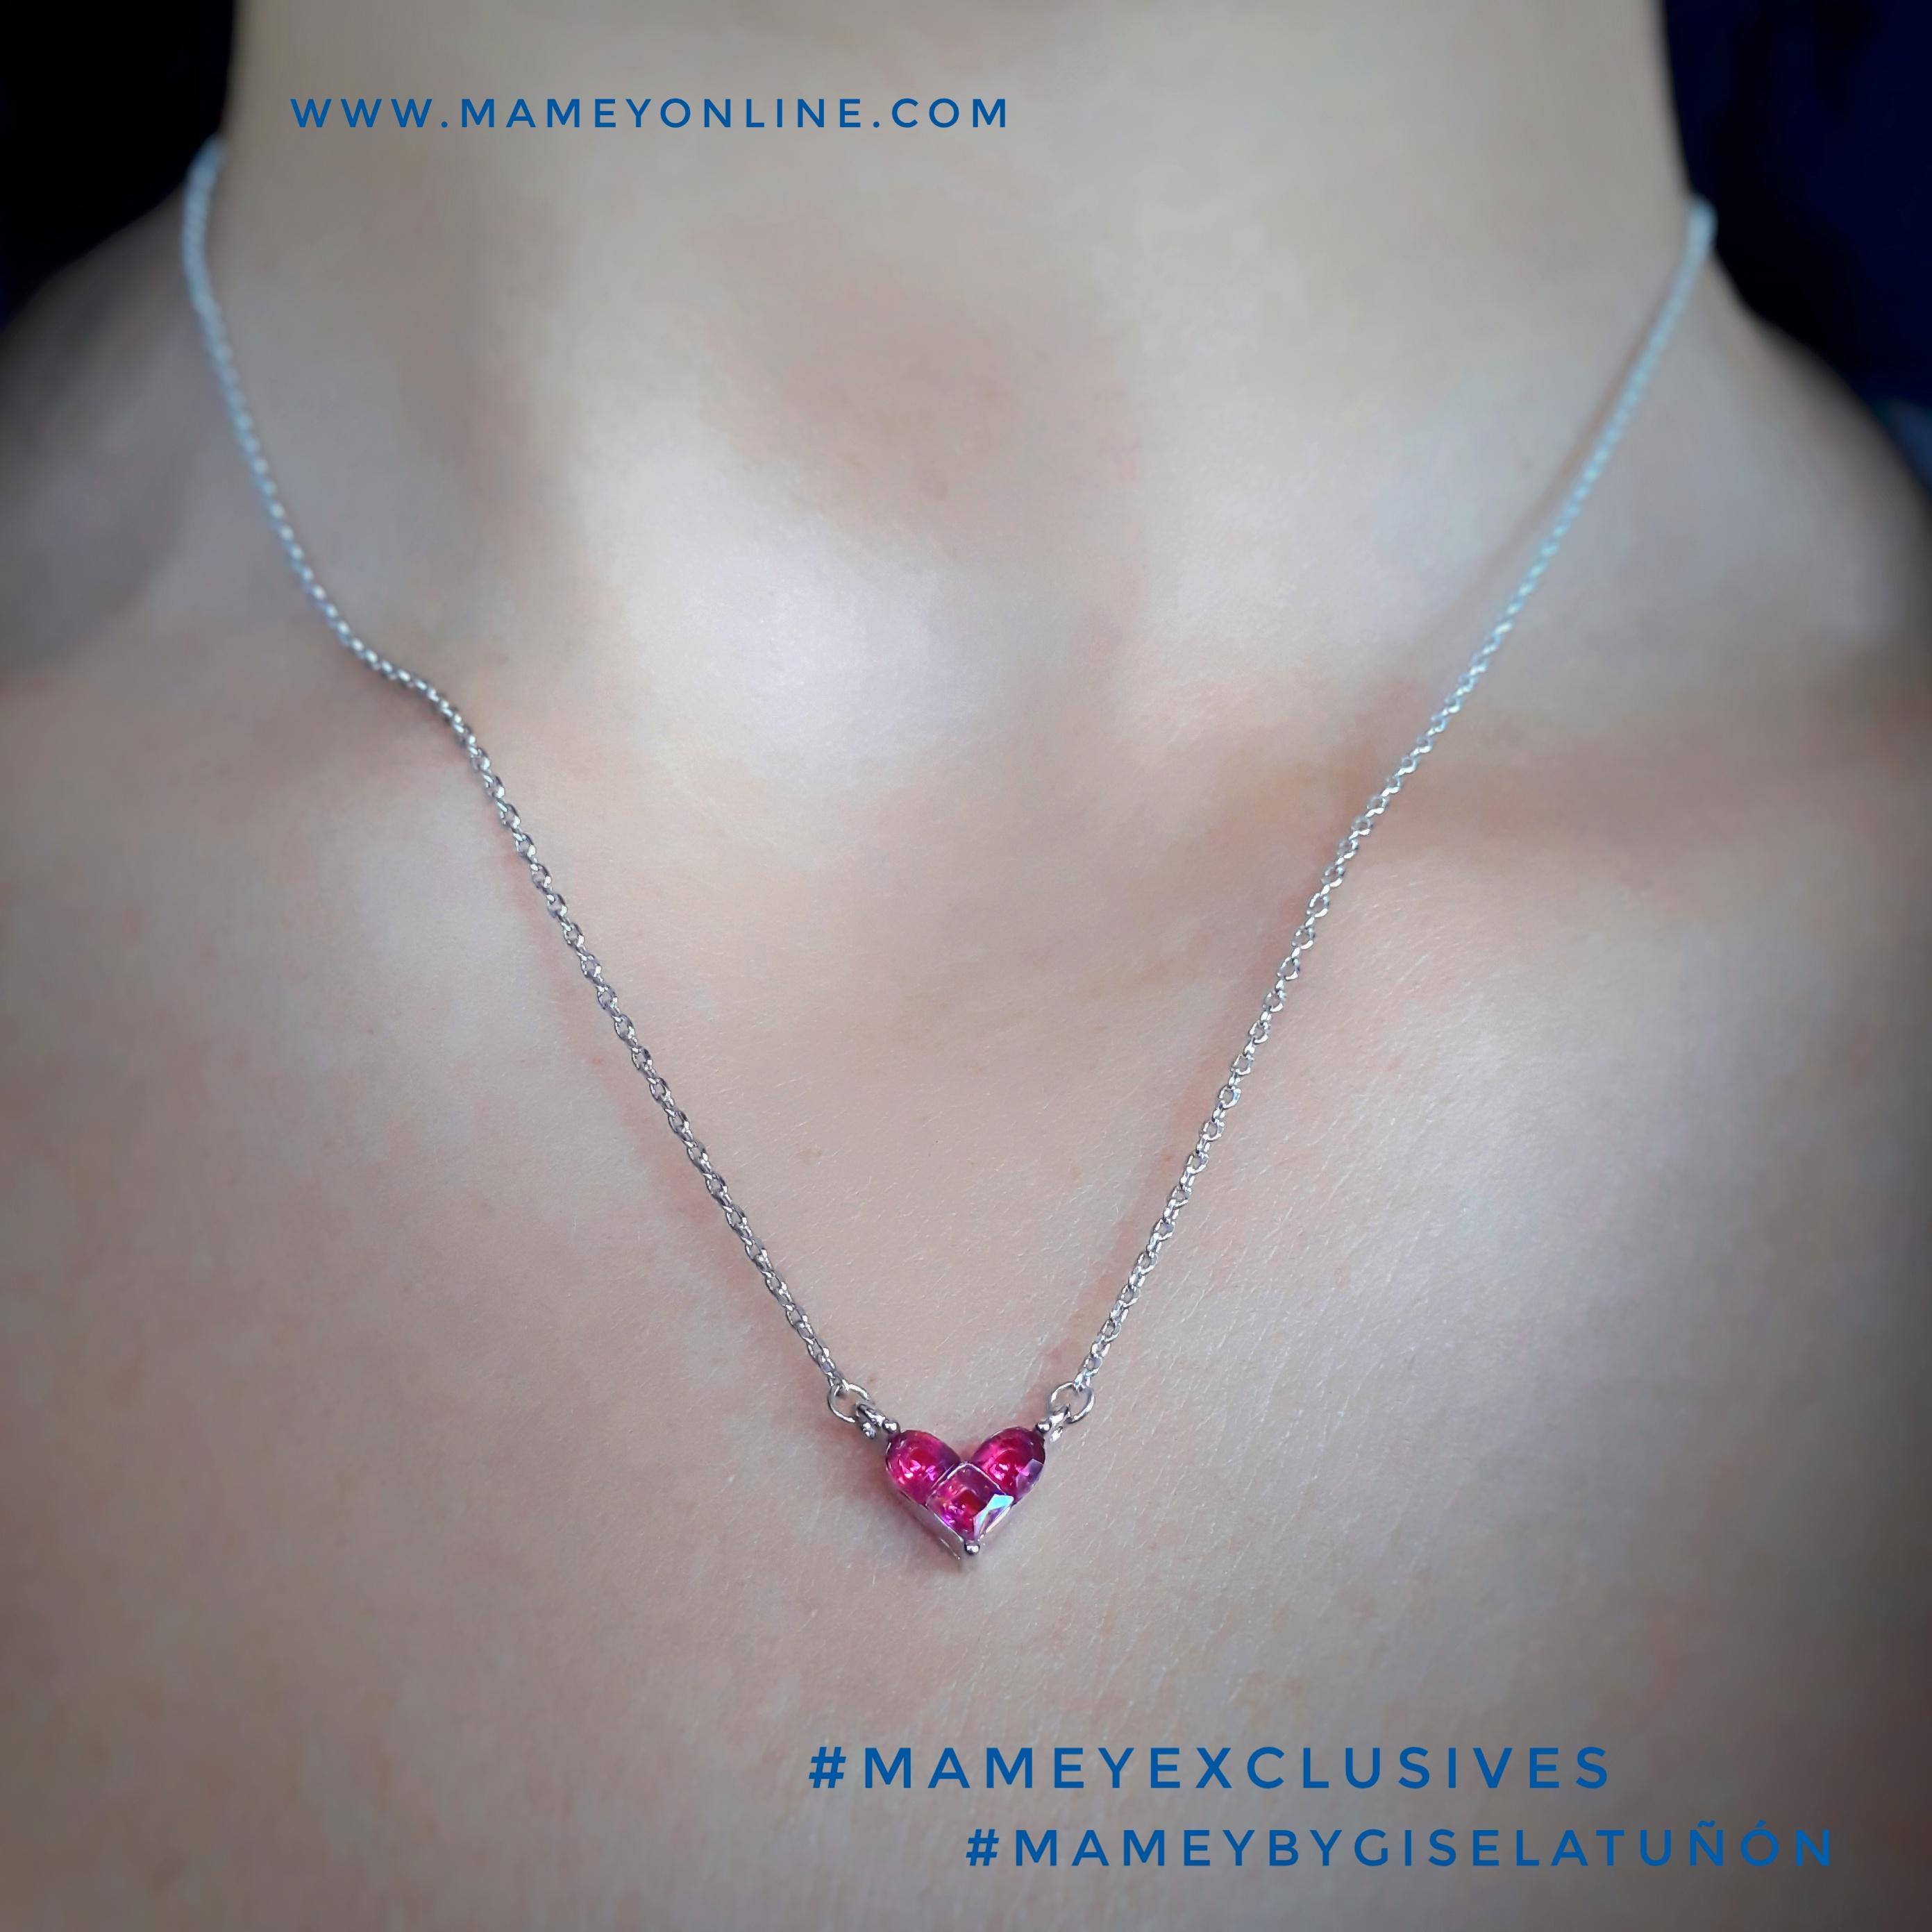 3e596f492d7d MA02 – Collar de acero inoxidable con corazón de cristales color rosa  intenso